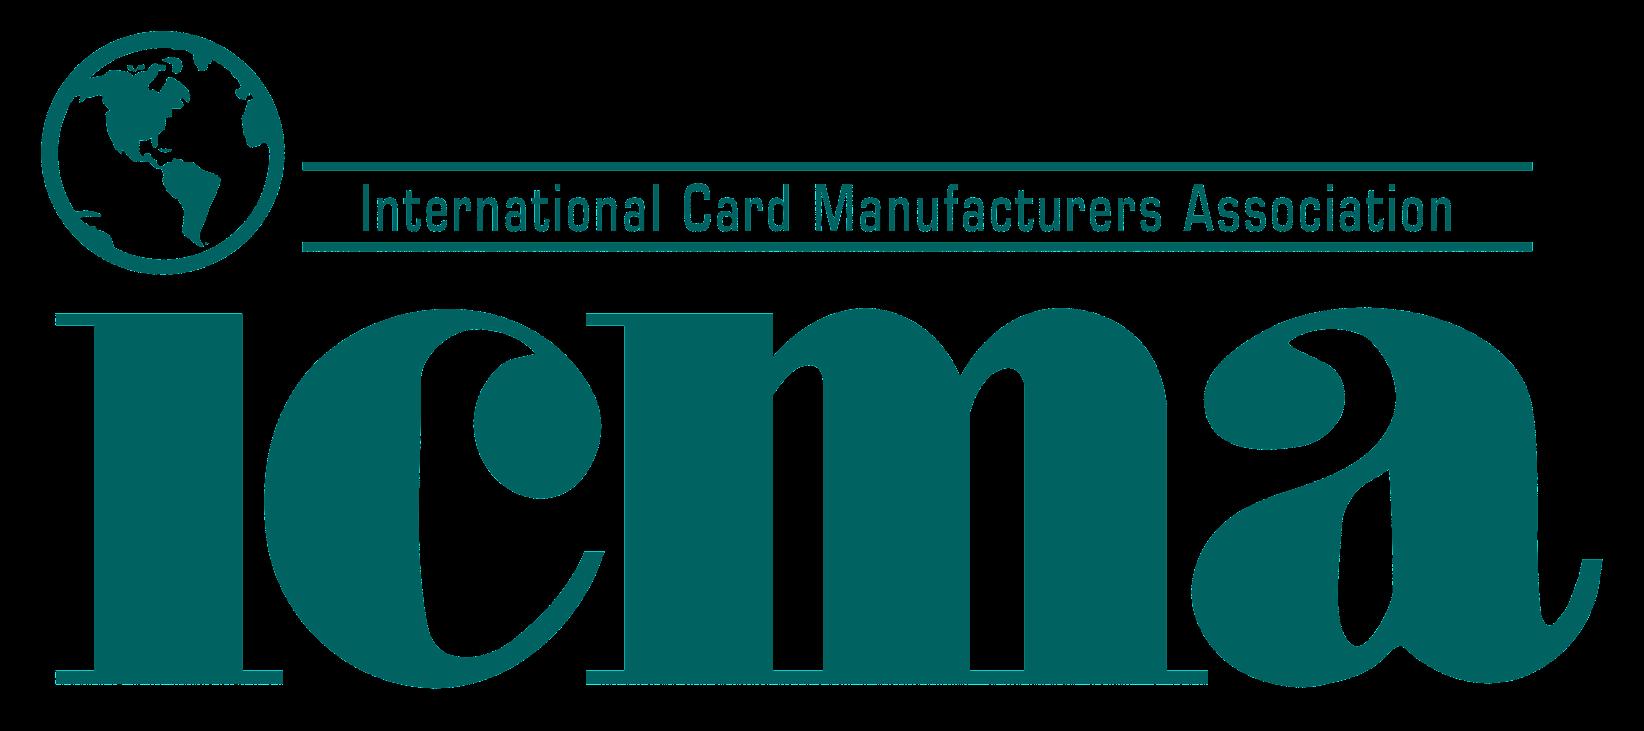 ICMA (International Card Manufacturers Association)